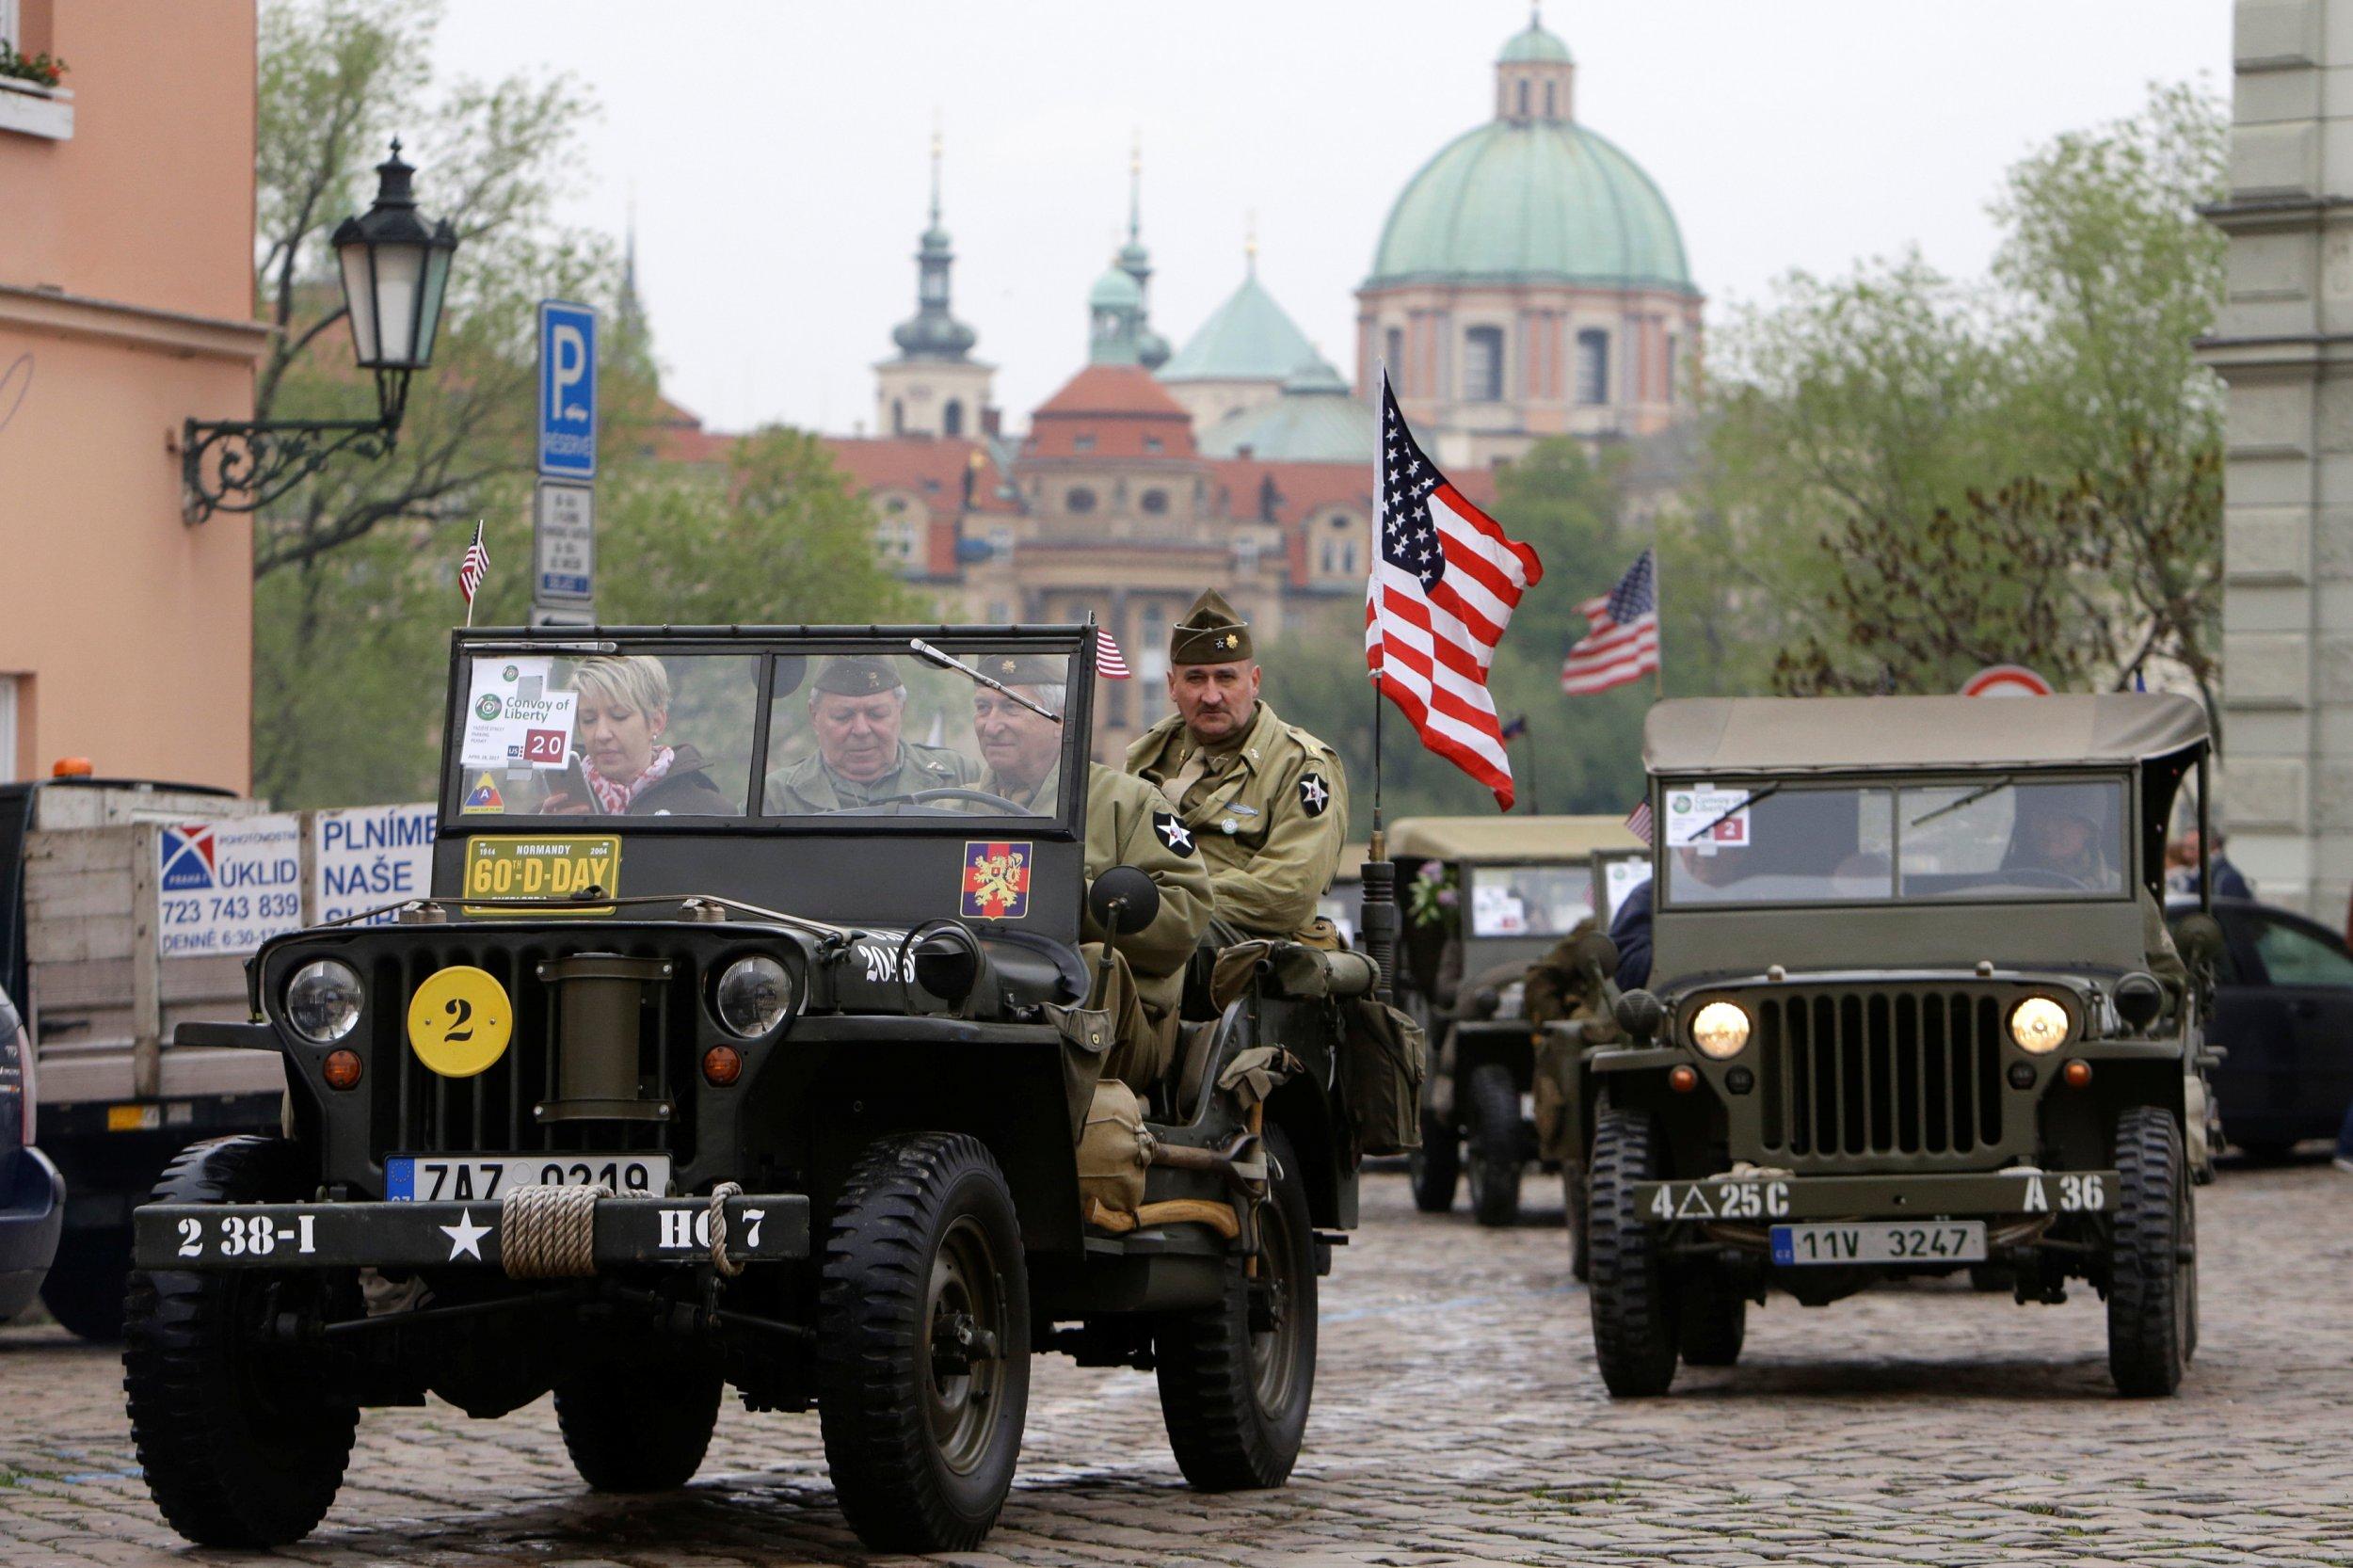 U.S. flag in Prague